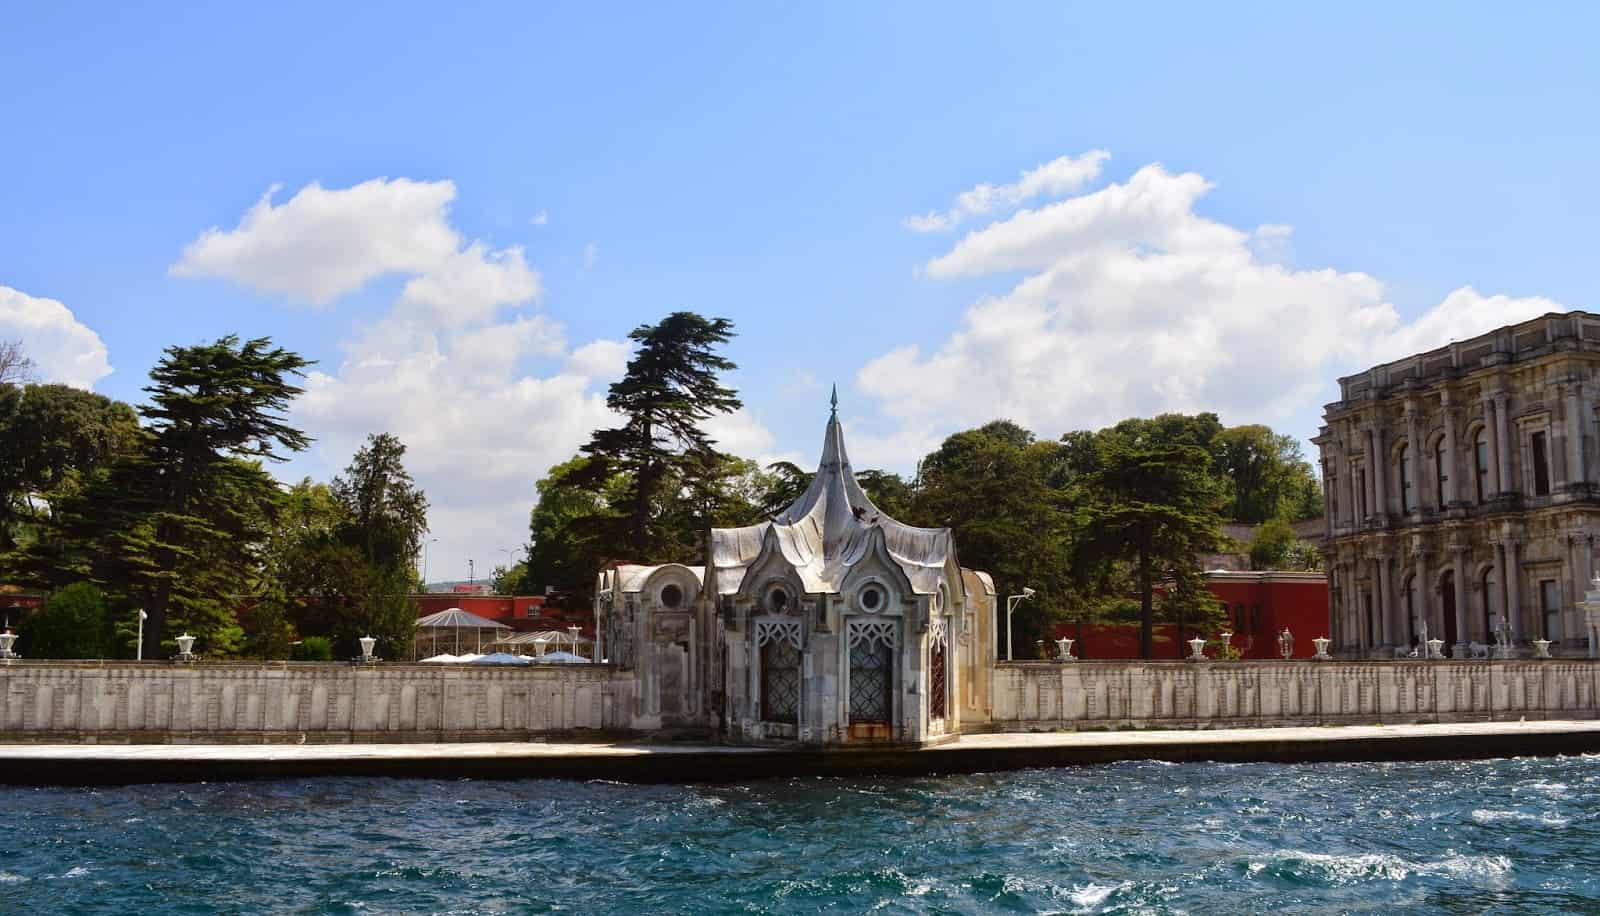 Marine Pavillions of the Beylerbeyi Palace